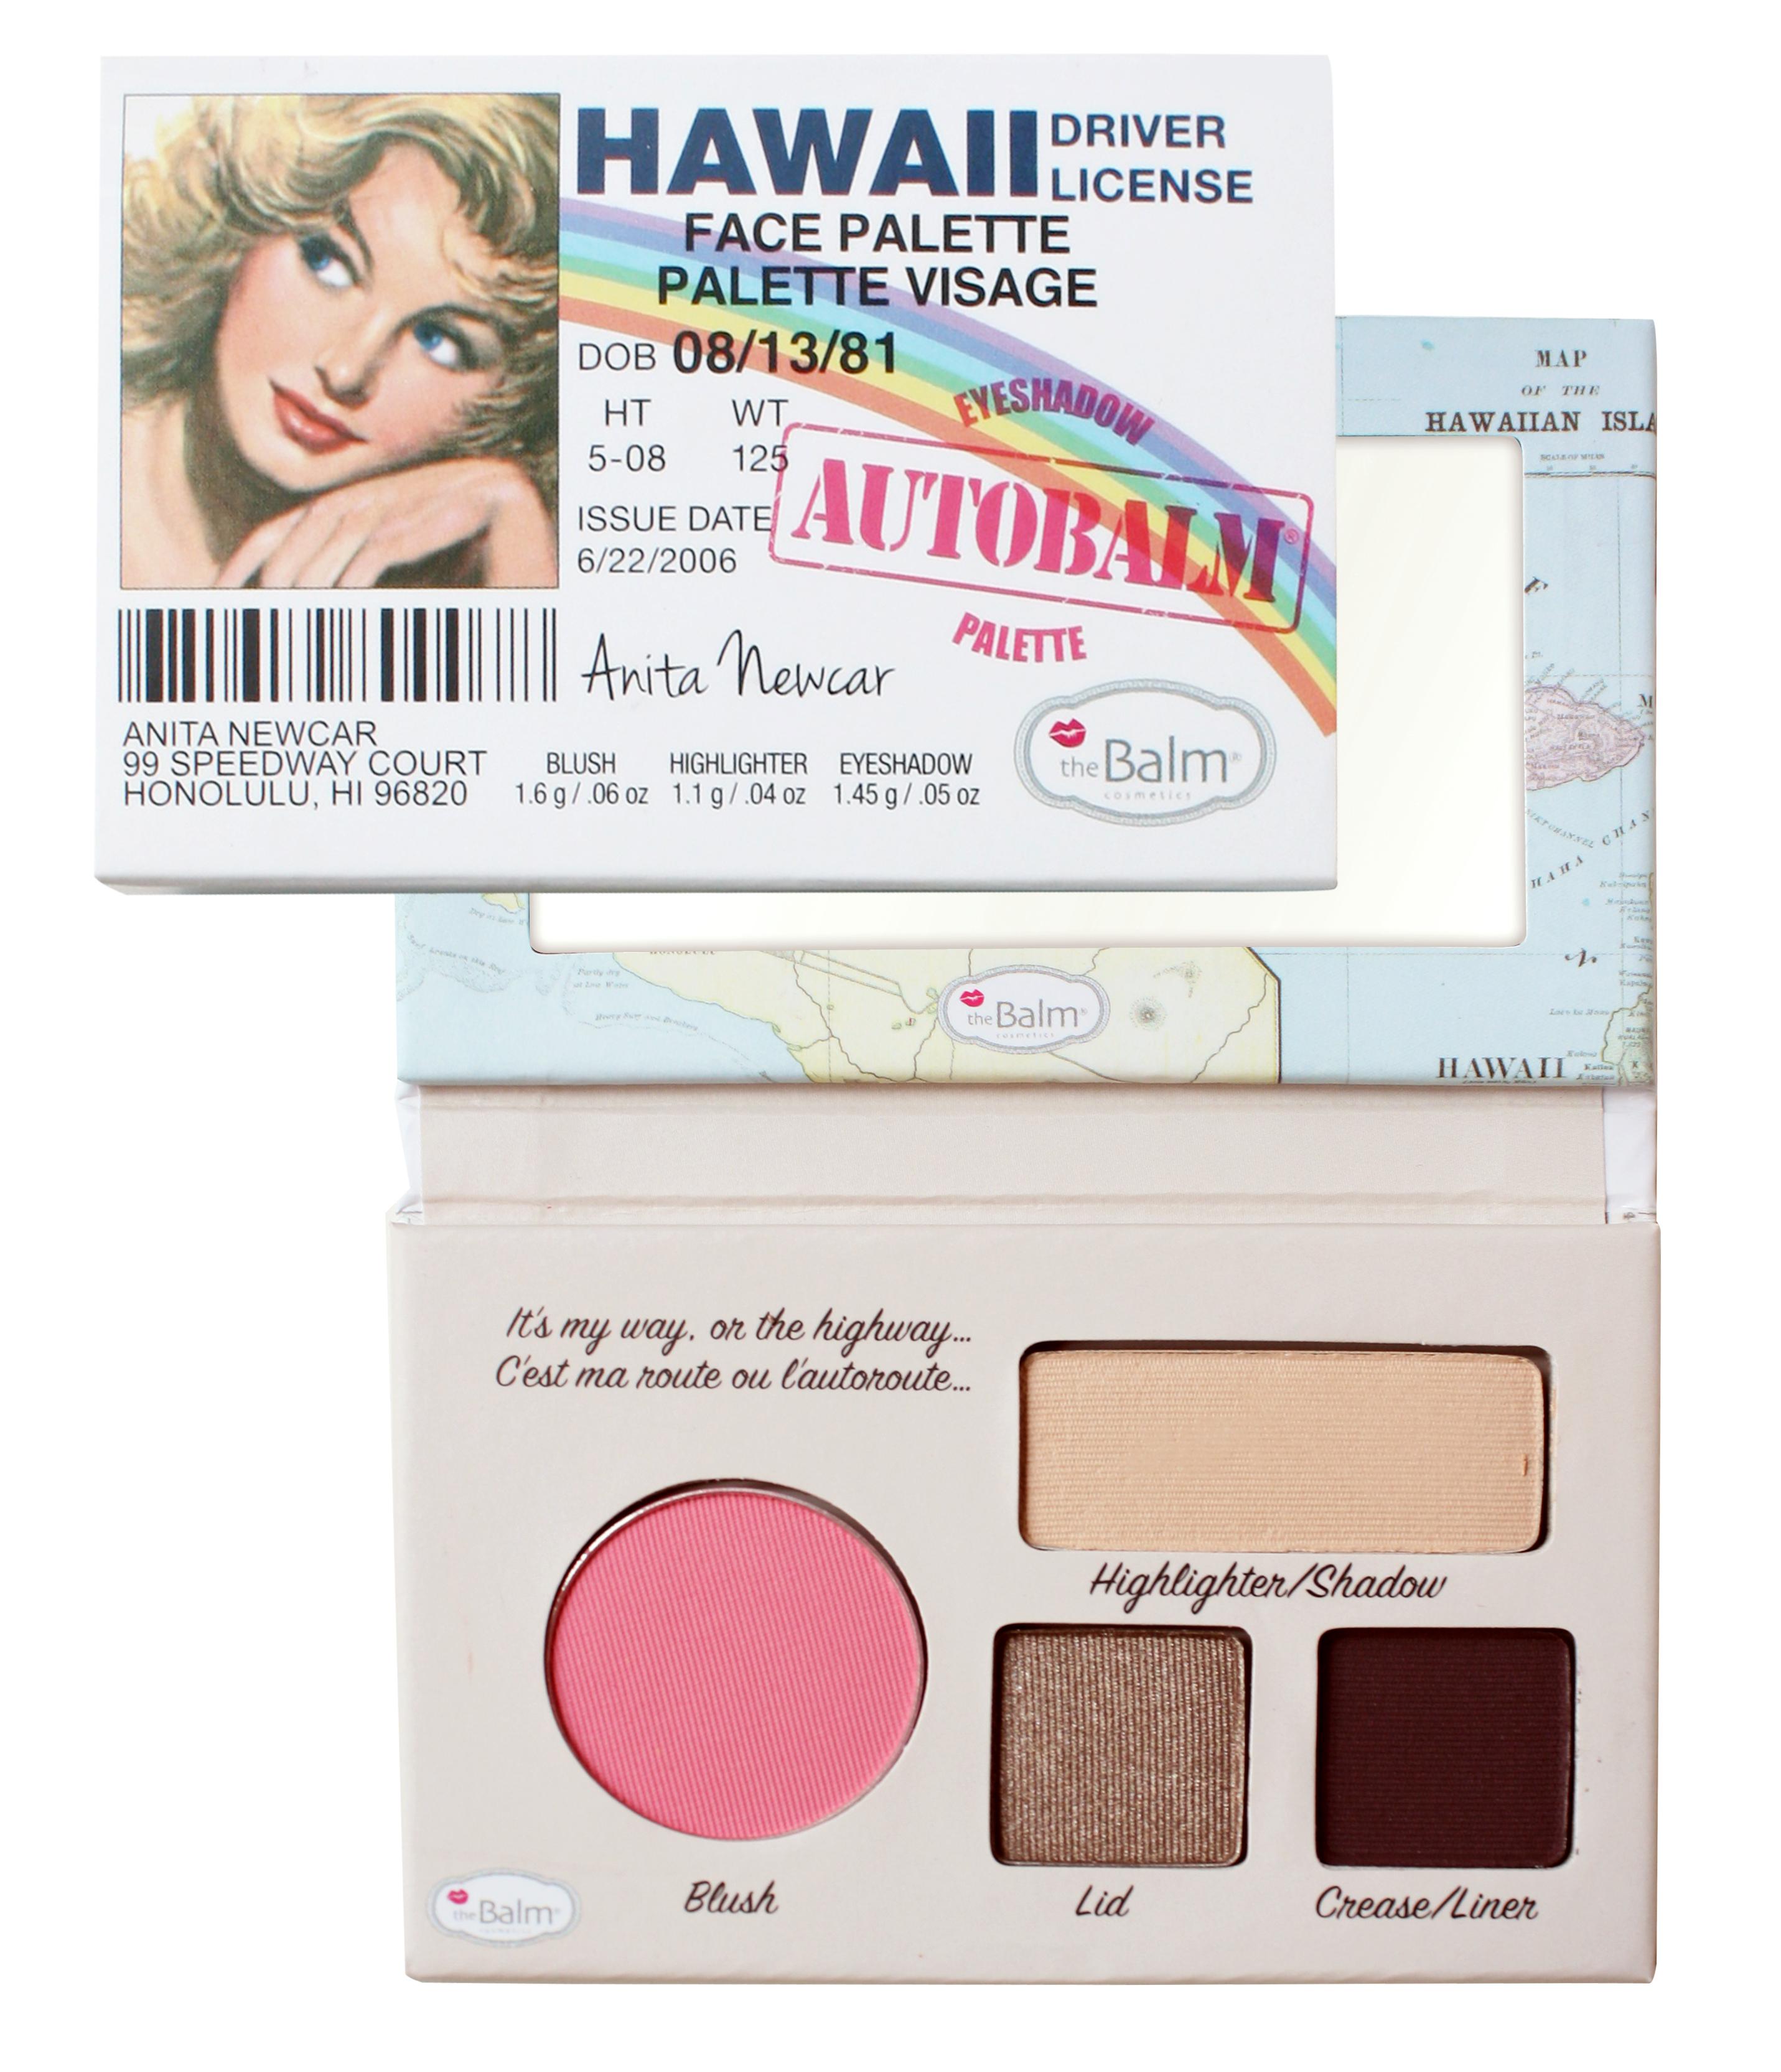 Autobalm Hawaii Eyeshadow AutoBalm Hawaii Face Palette